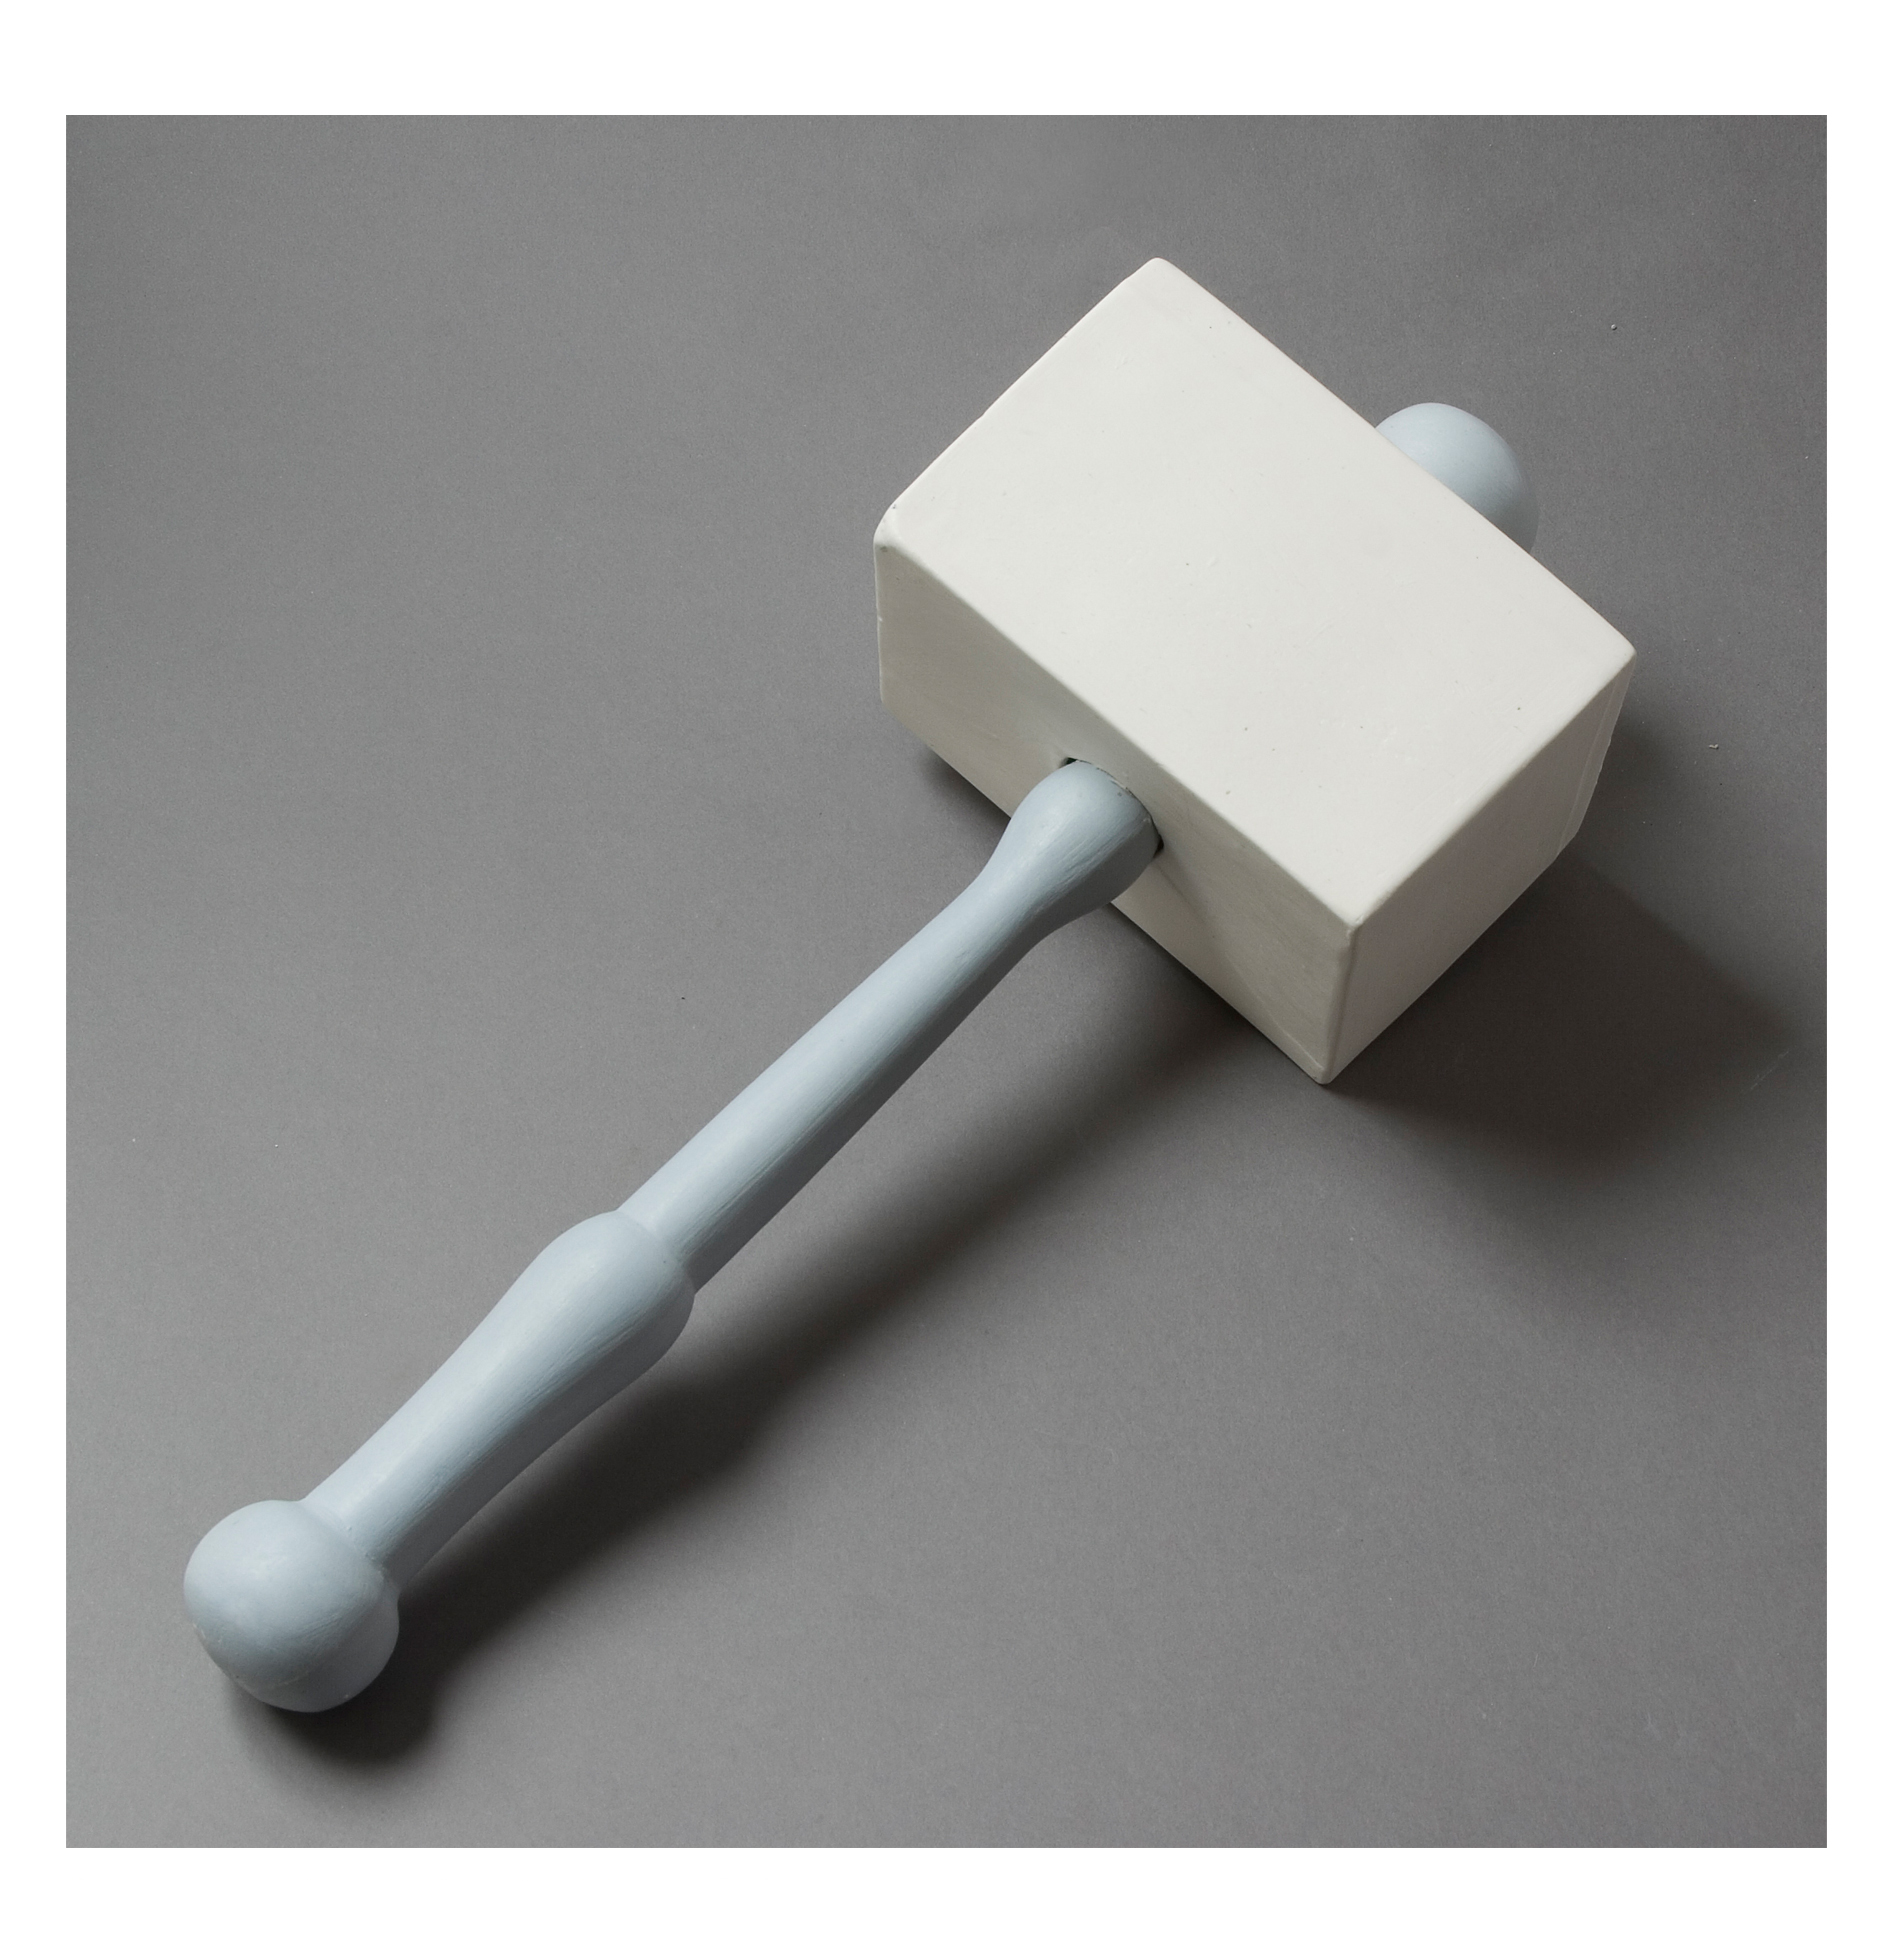 Programmed Obsolescence - Single Use Hammer